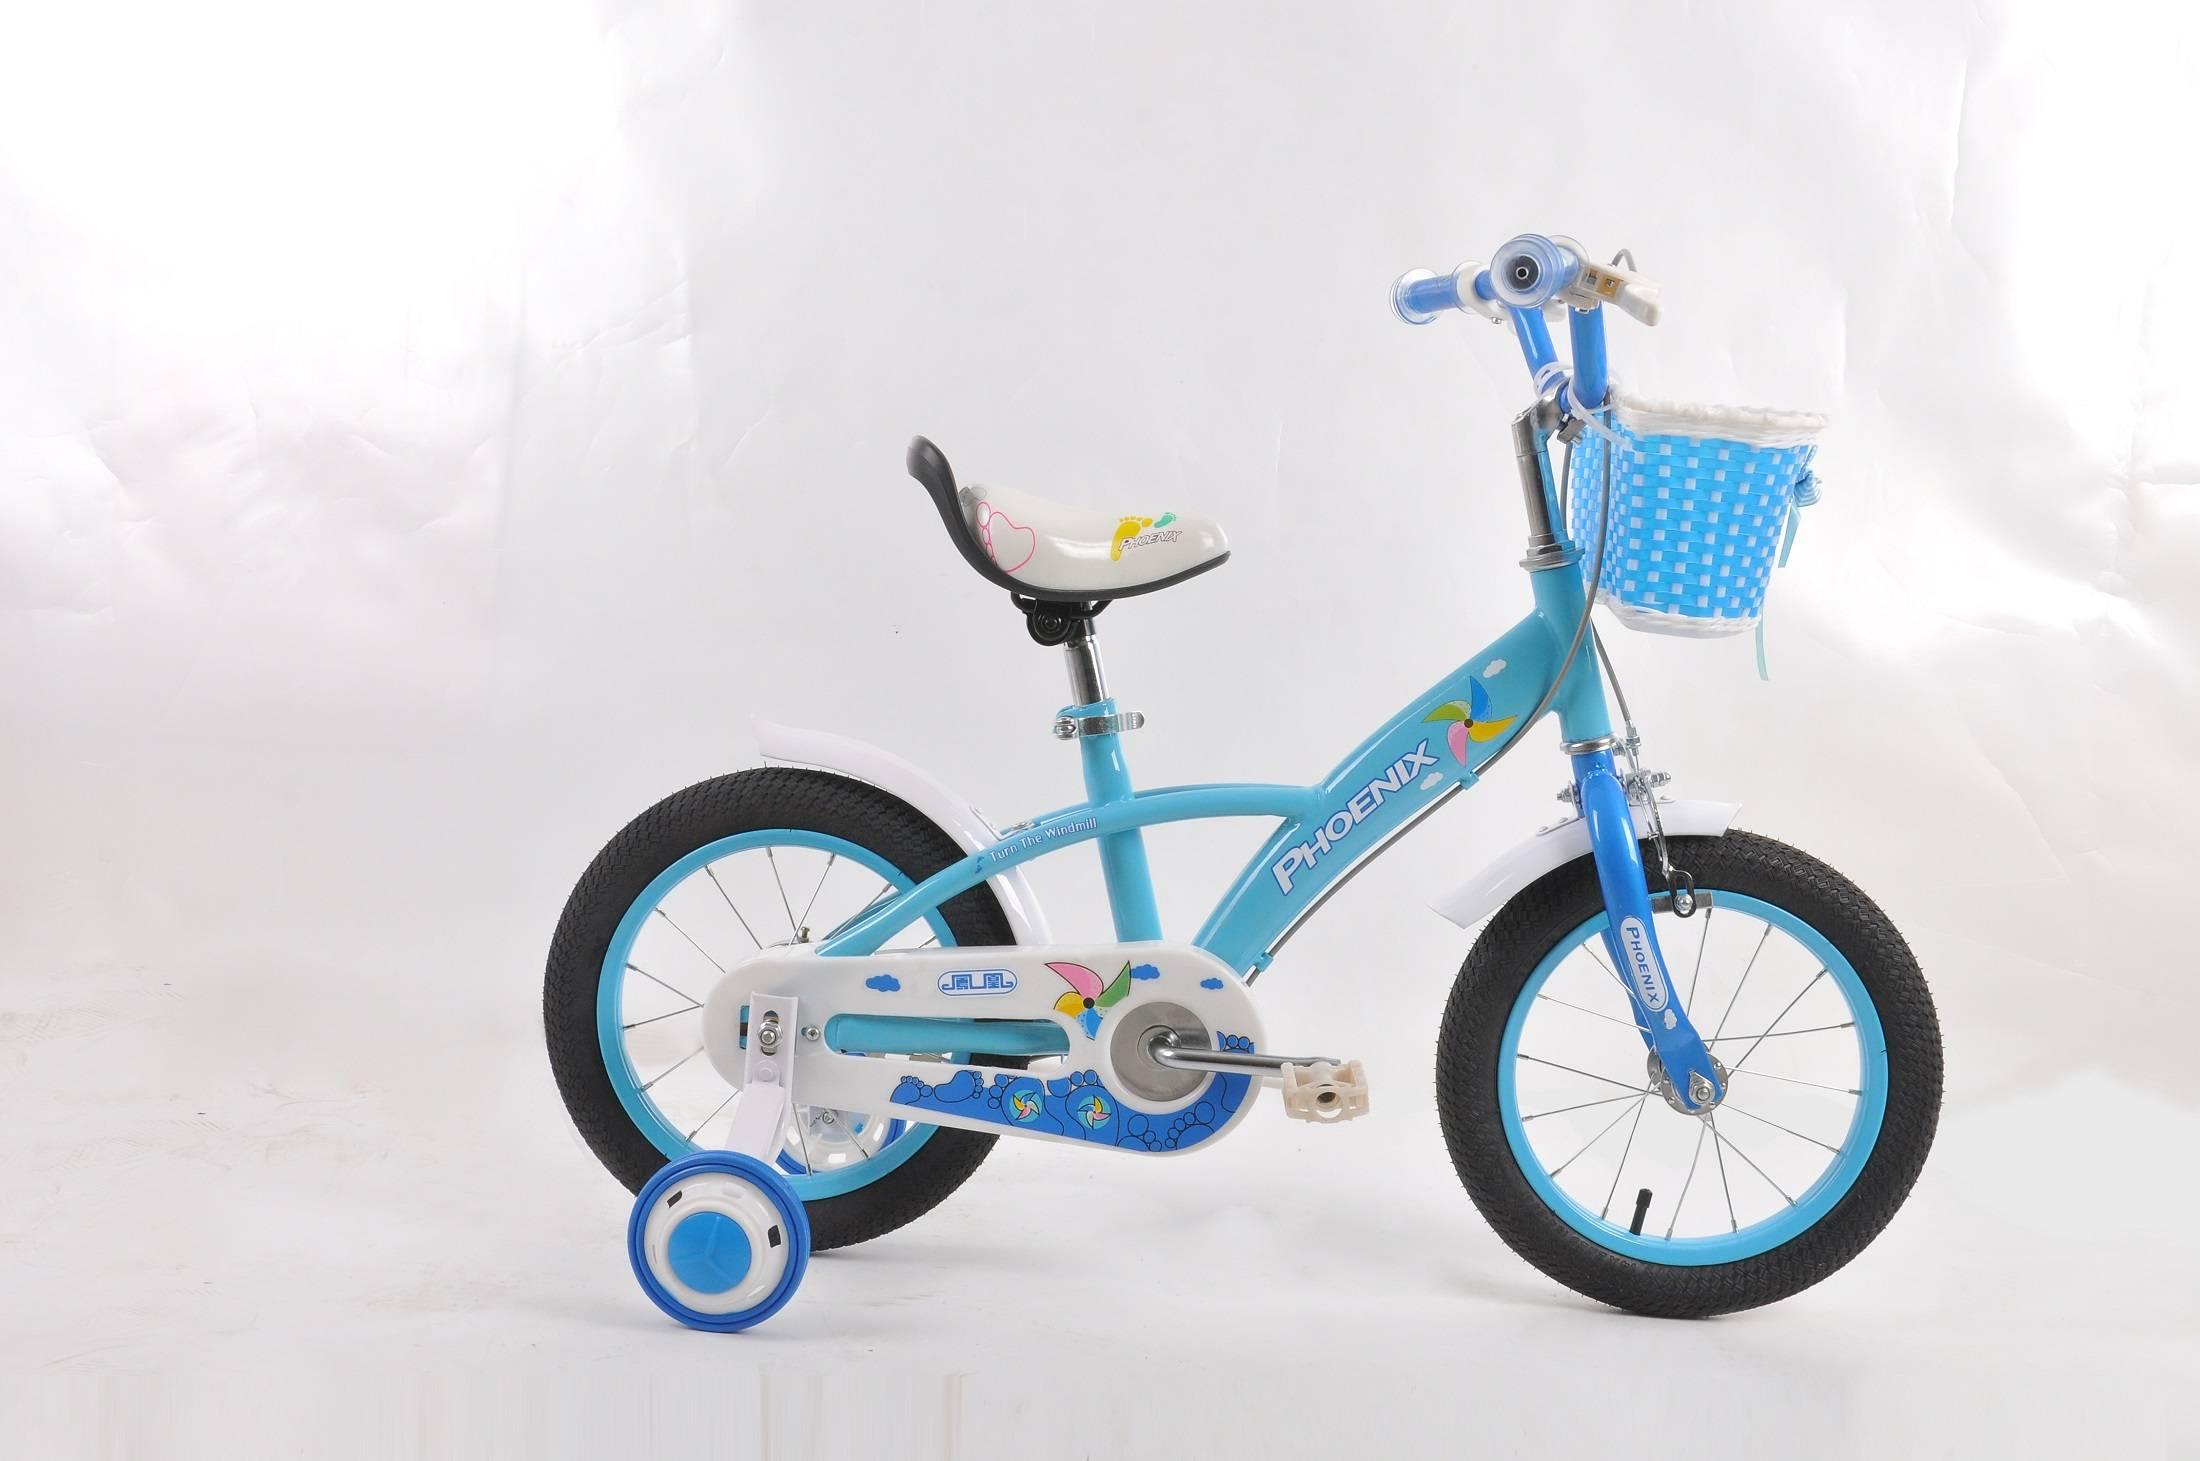 pink basket bicycle for baby,kids training bike, kids bicycle four wheels